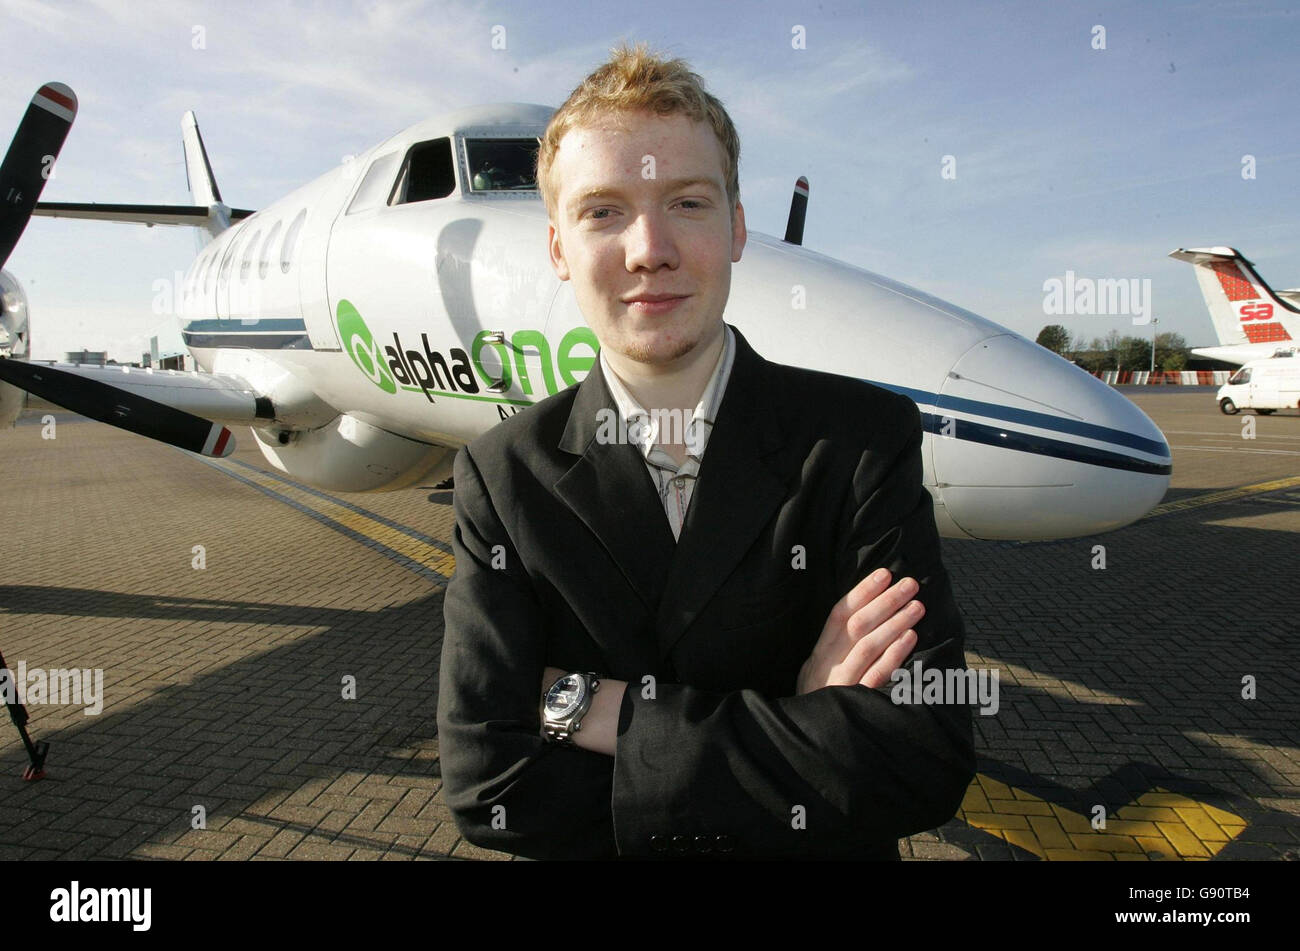 AIR Alpha - Stock Image